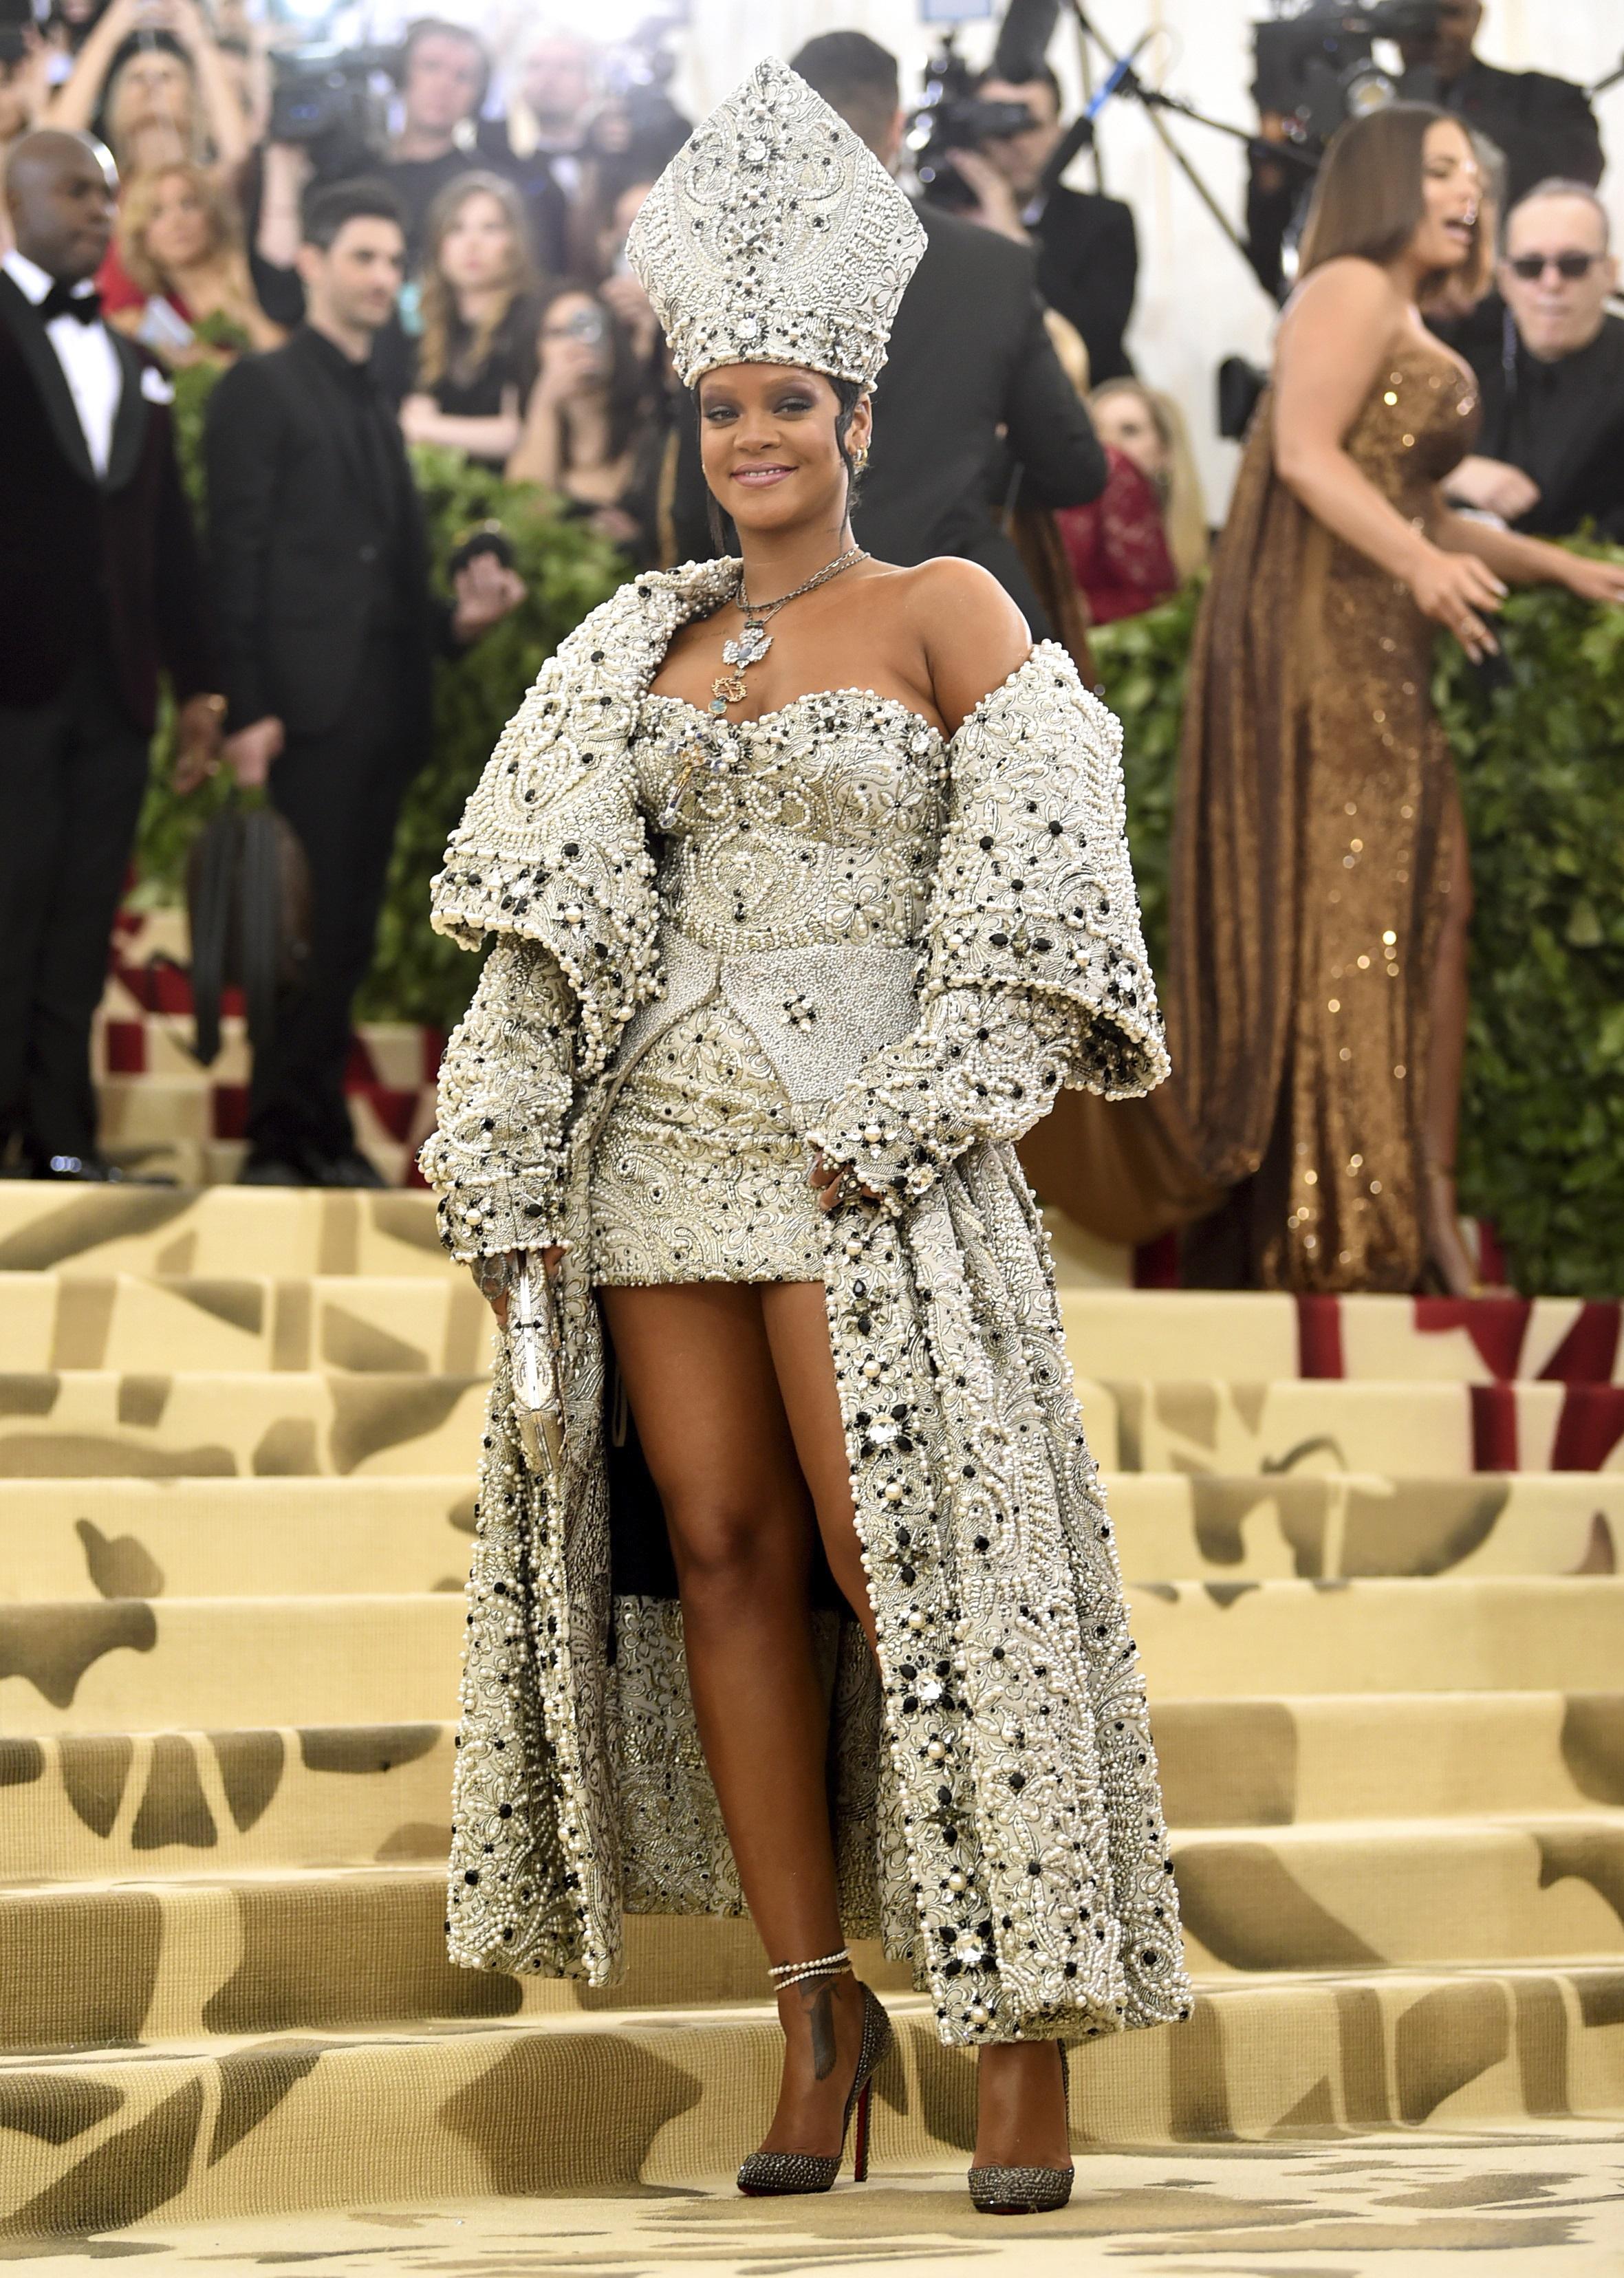 <div class='meta'><div class='origin-logo' data-origin='none'></div><span class='caption-text' data-credit='Evan Agostini/Invision/AP'>Rihanna (Photo by Evan Agostini/Invision/AP)</span></div>